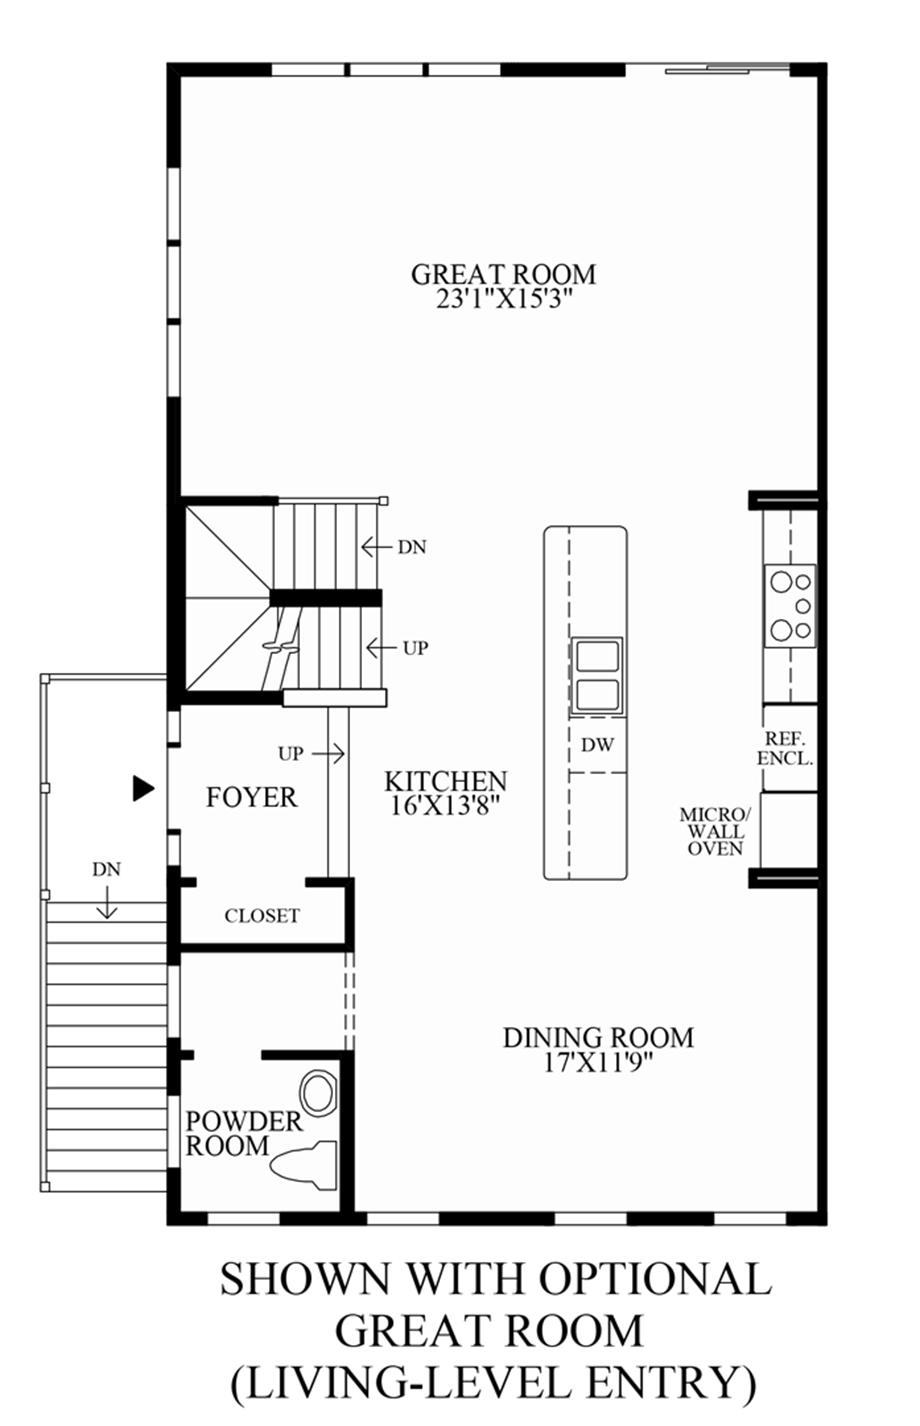 Optional Great Room (Living Level Entry) Floor Plan